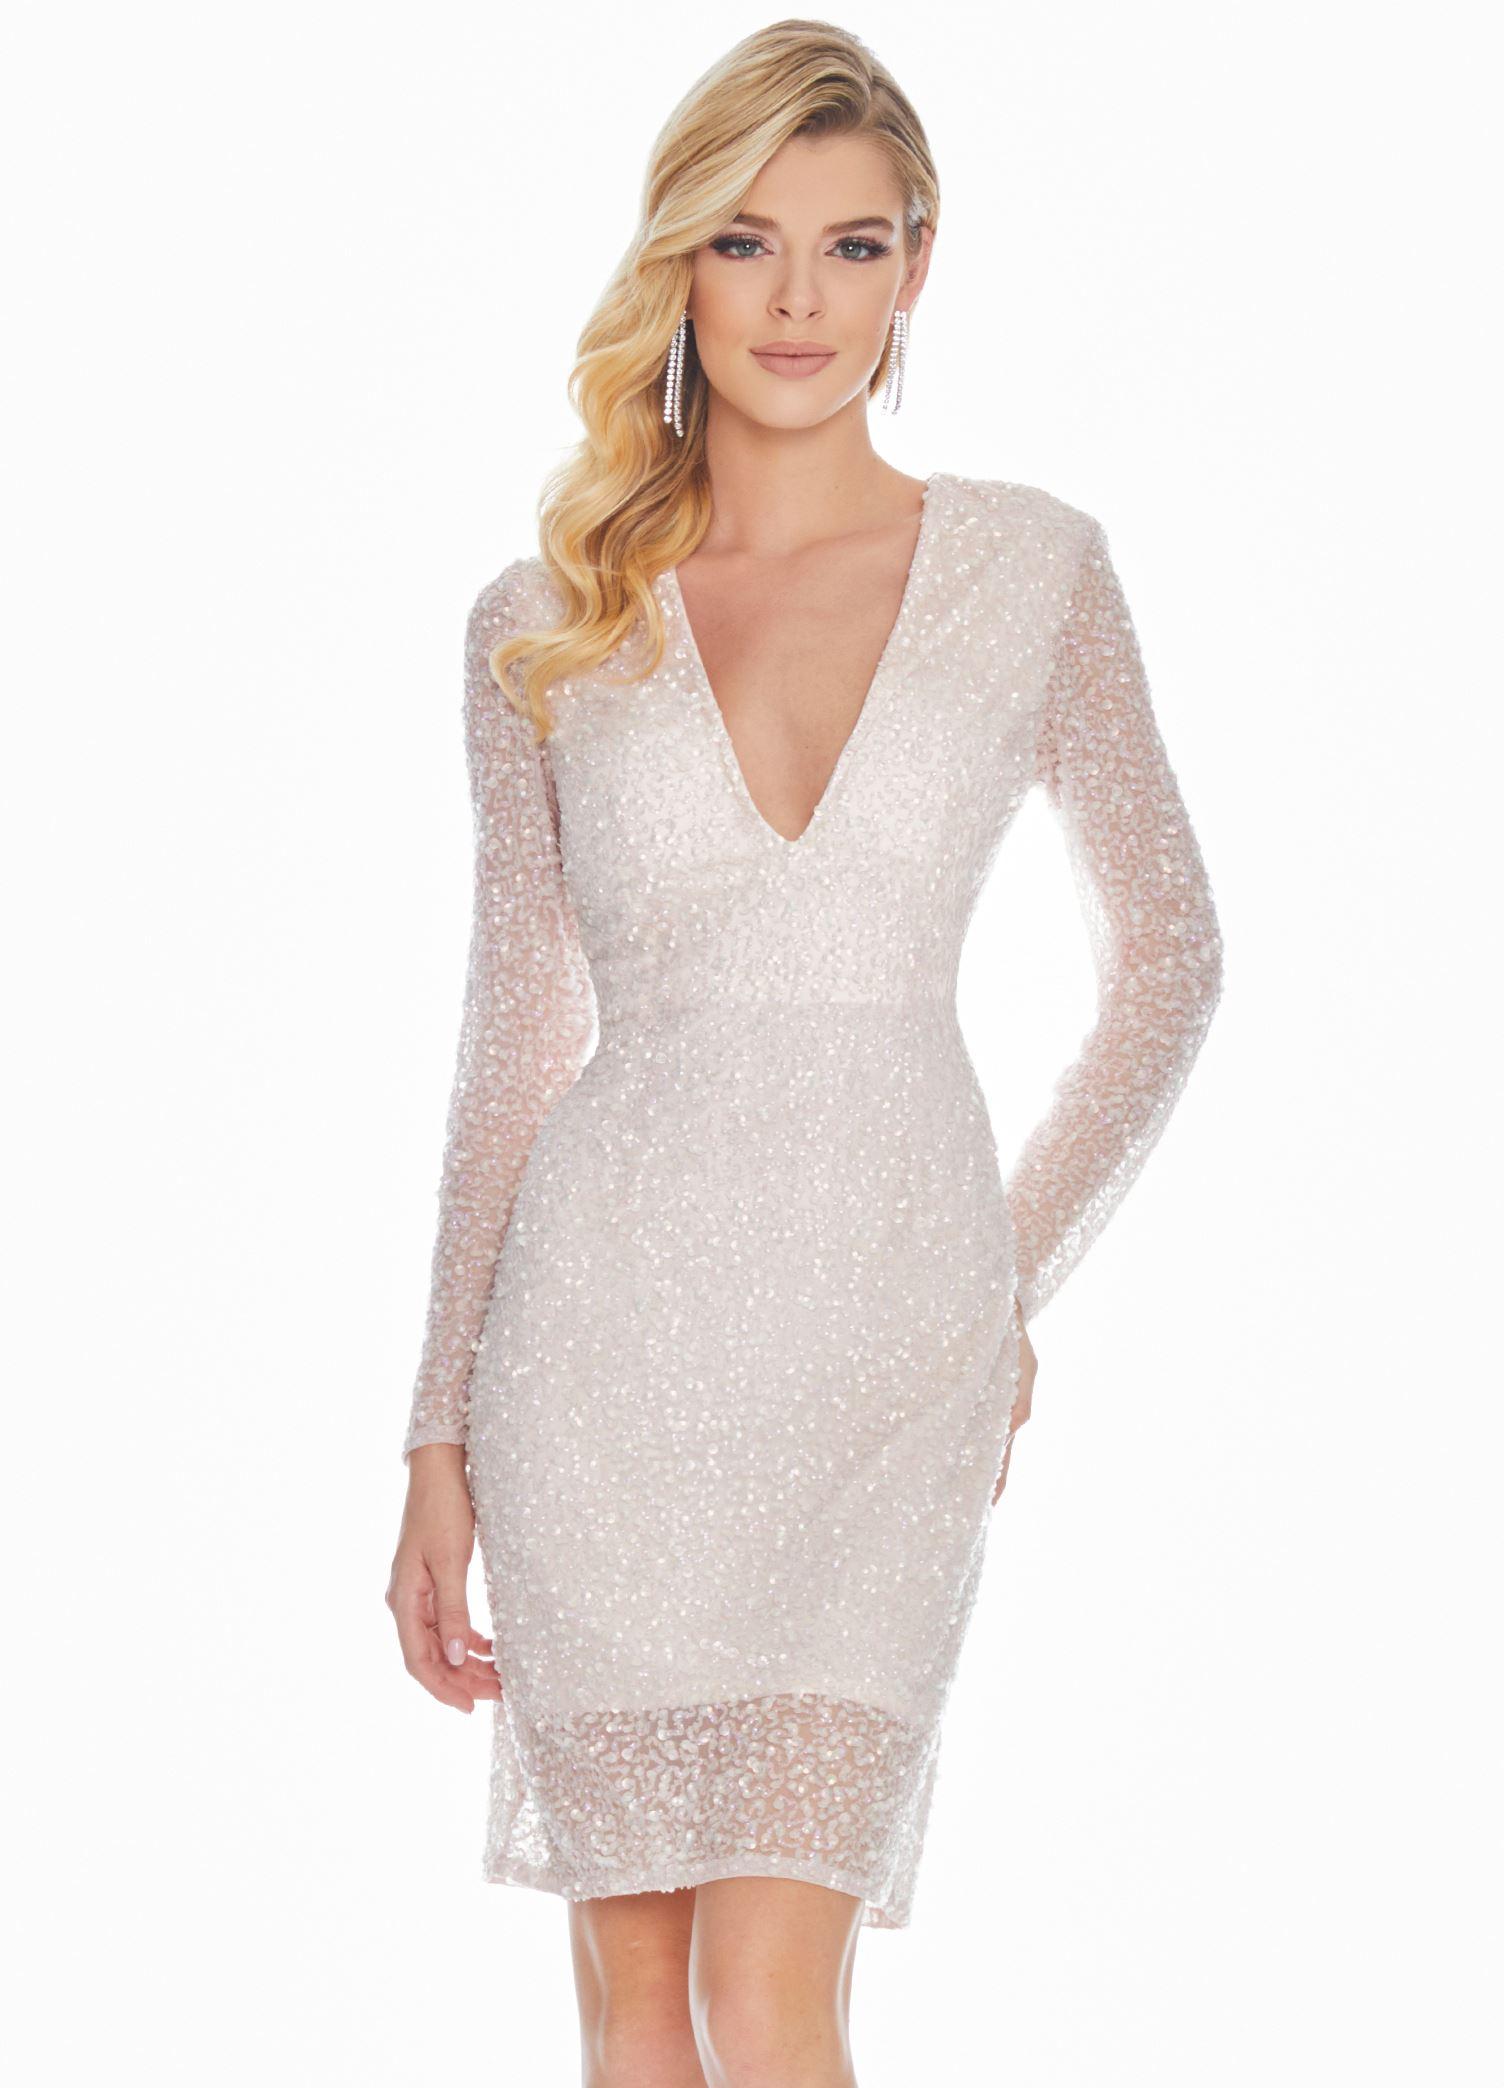 502f8b457b44 Ashley Lauren - Fully Beaded Powder Cocktail Dress   ASHLEYlauren